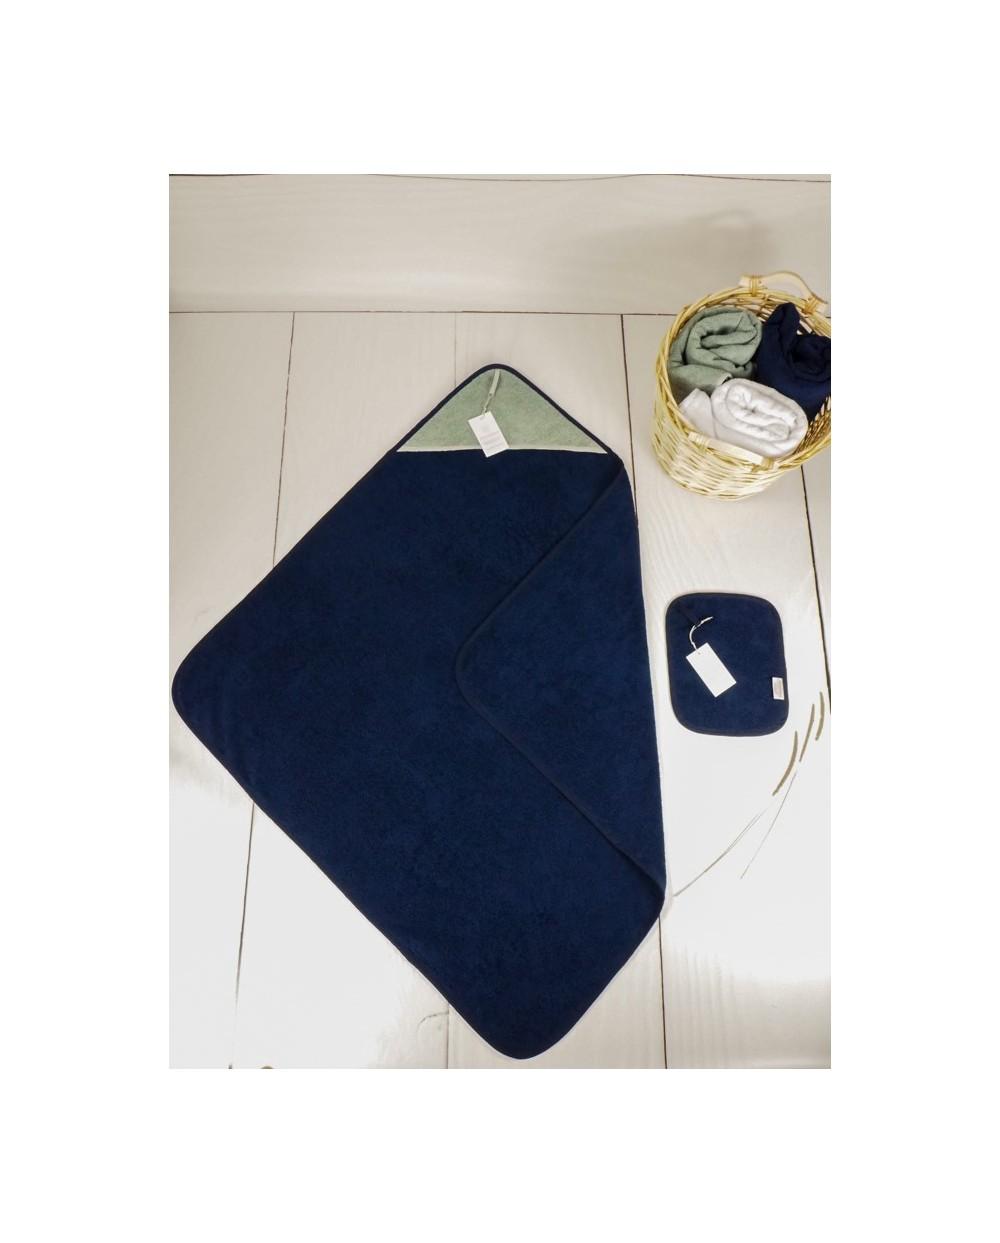 ręcznik granat frota niemowlęcy